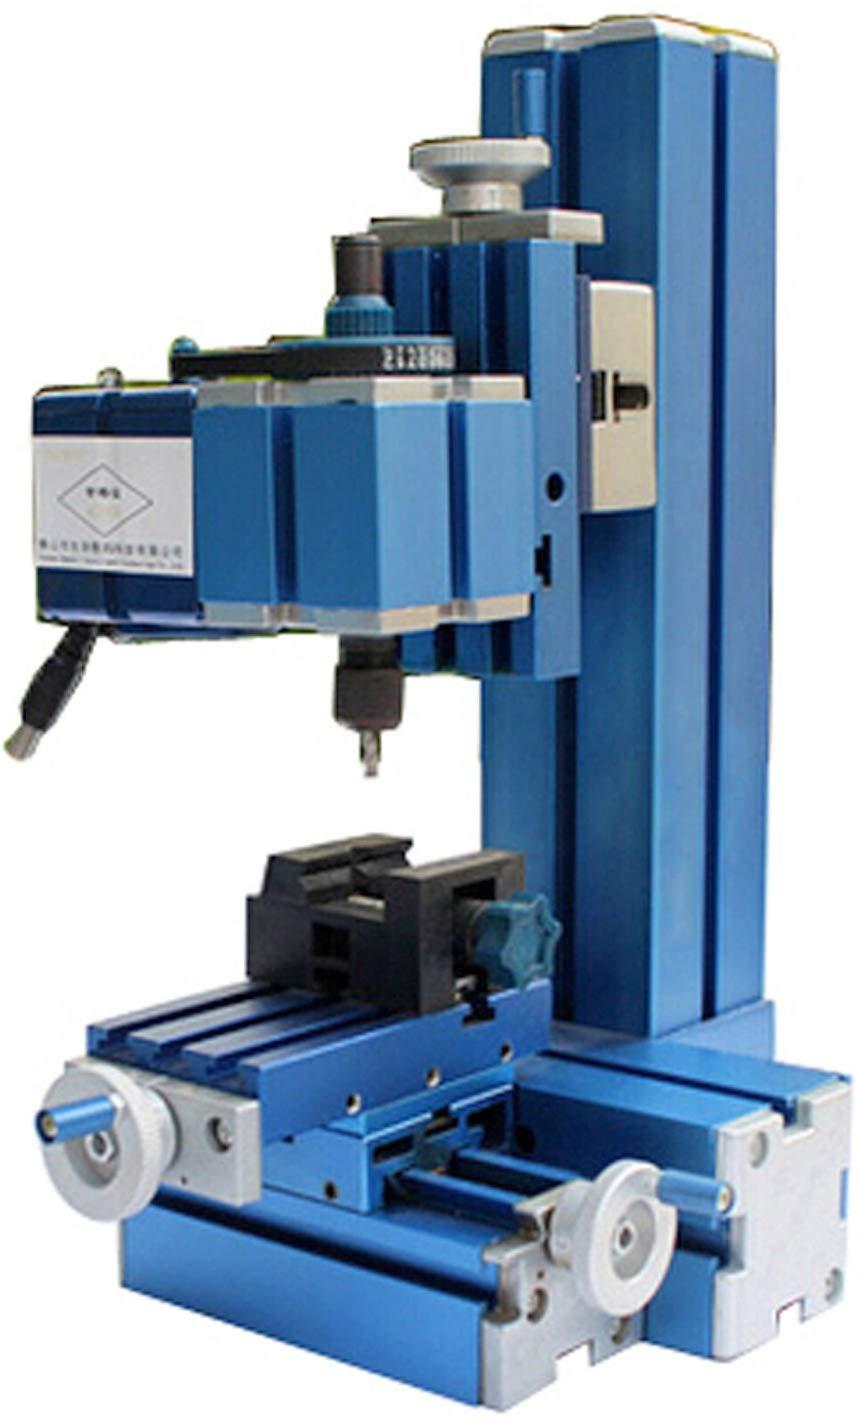 Sunwin Metal Mini Milling Machine